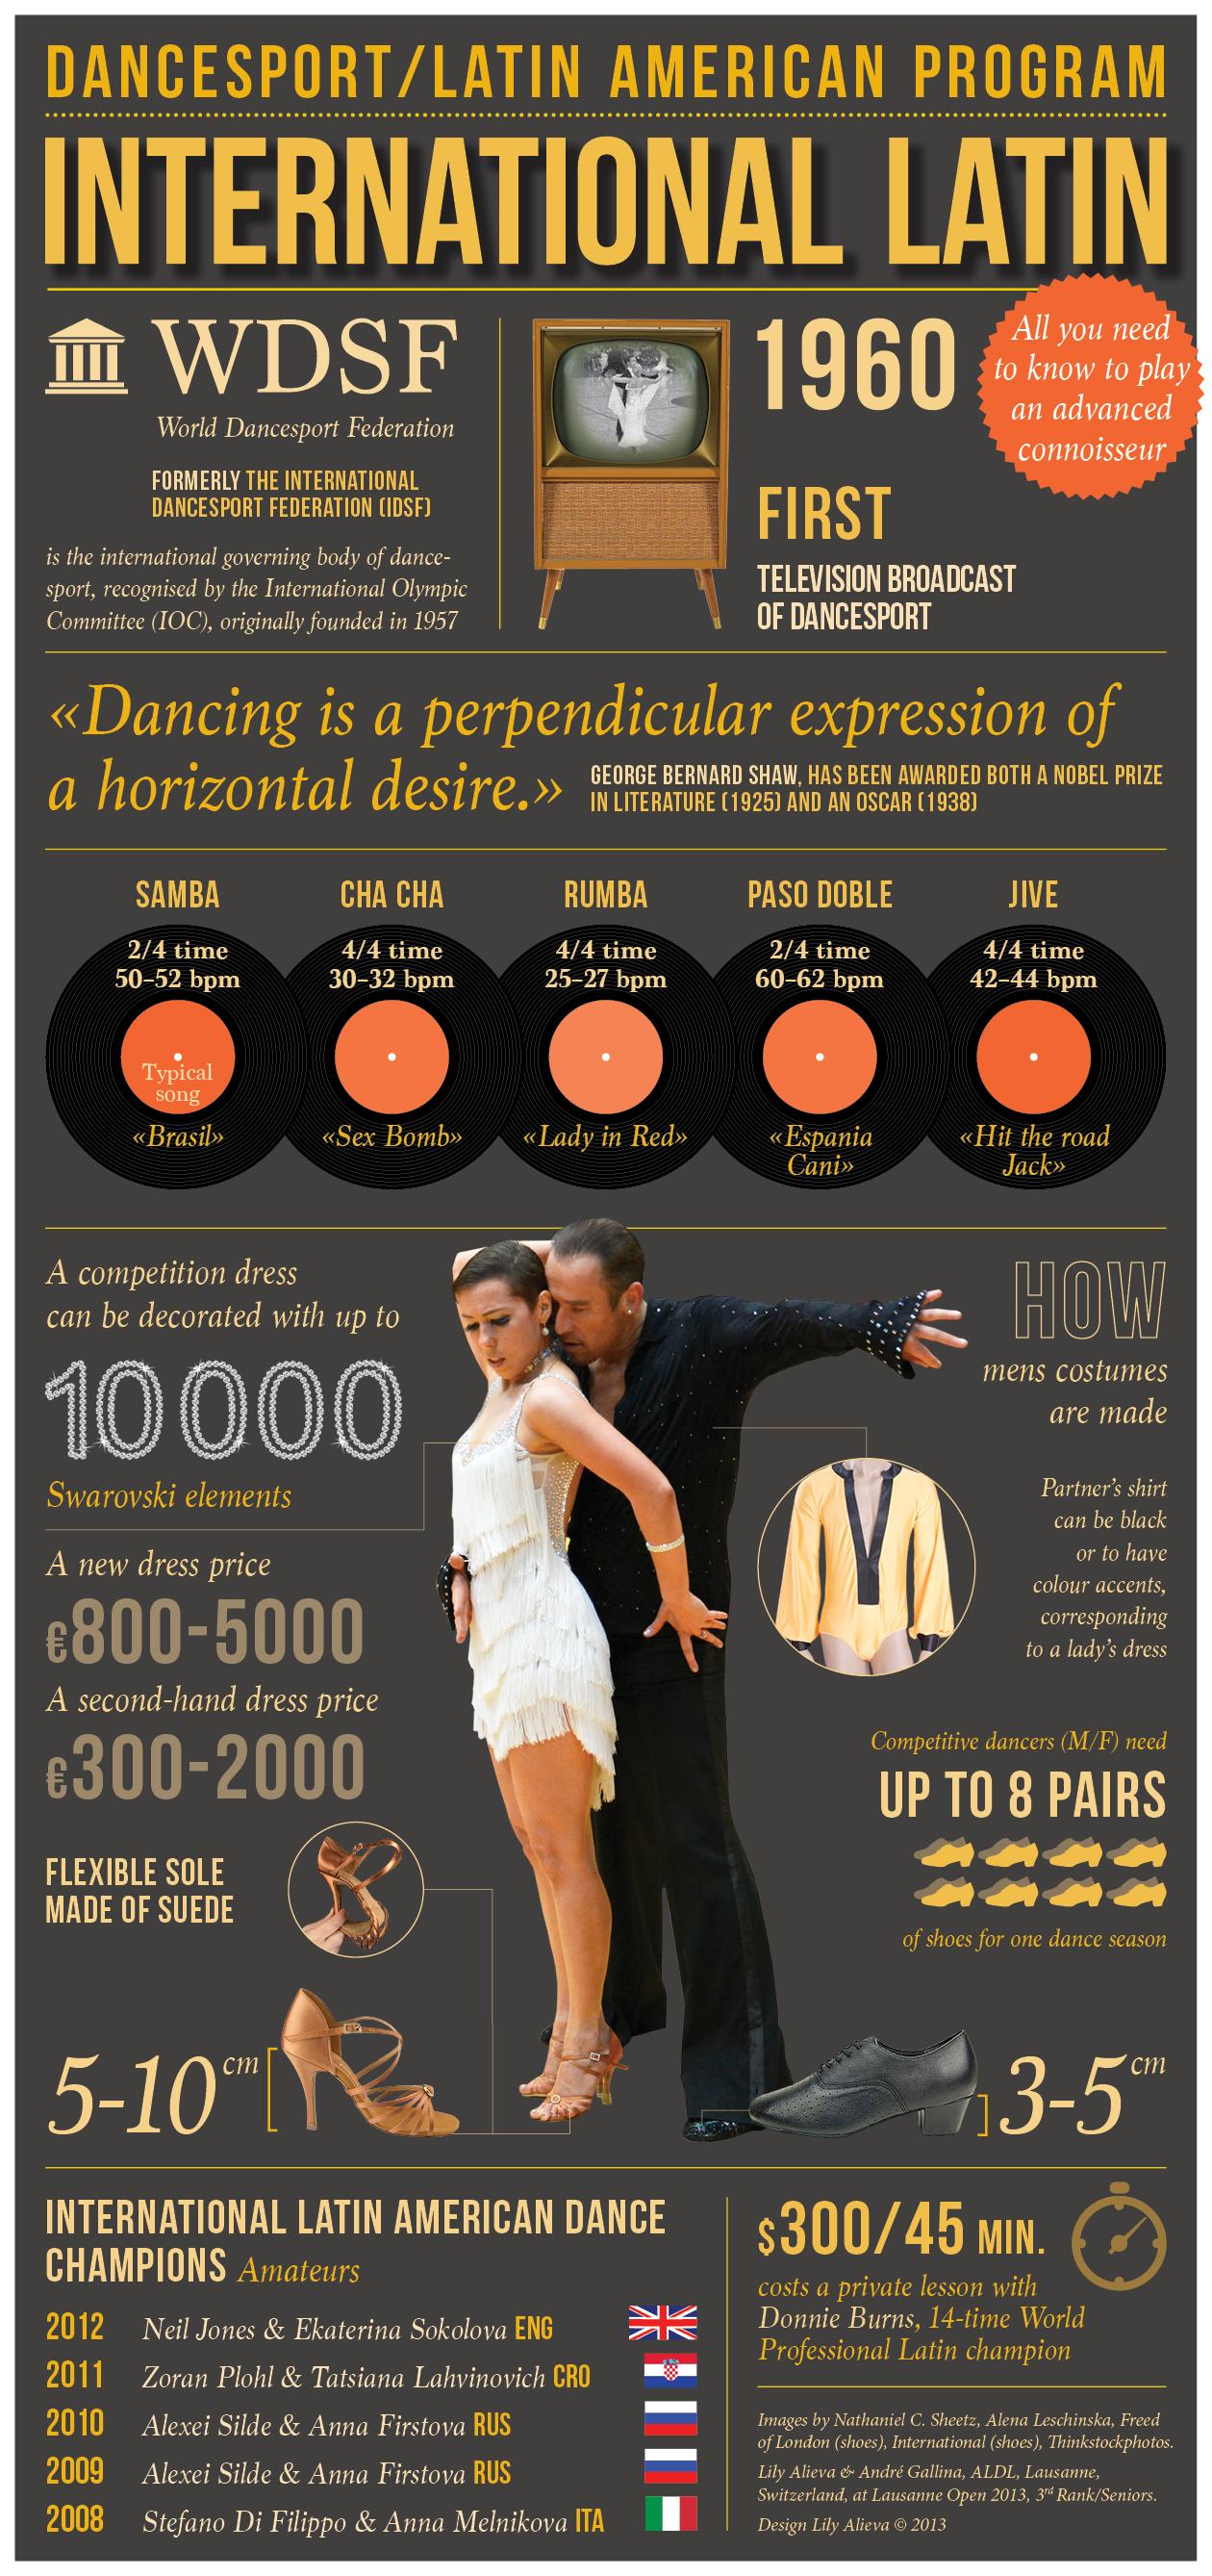 Dance Sport: Latin American Program [INFOGRAPHIC ...